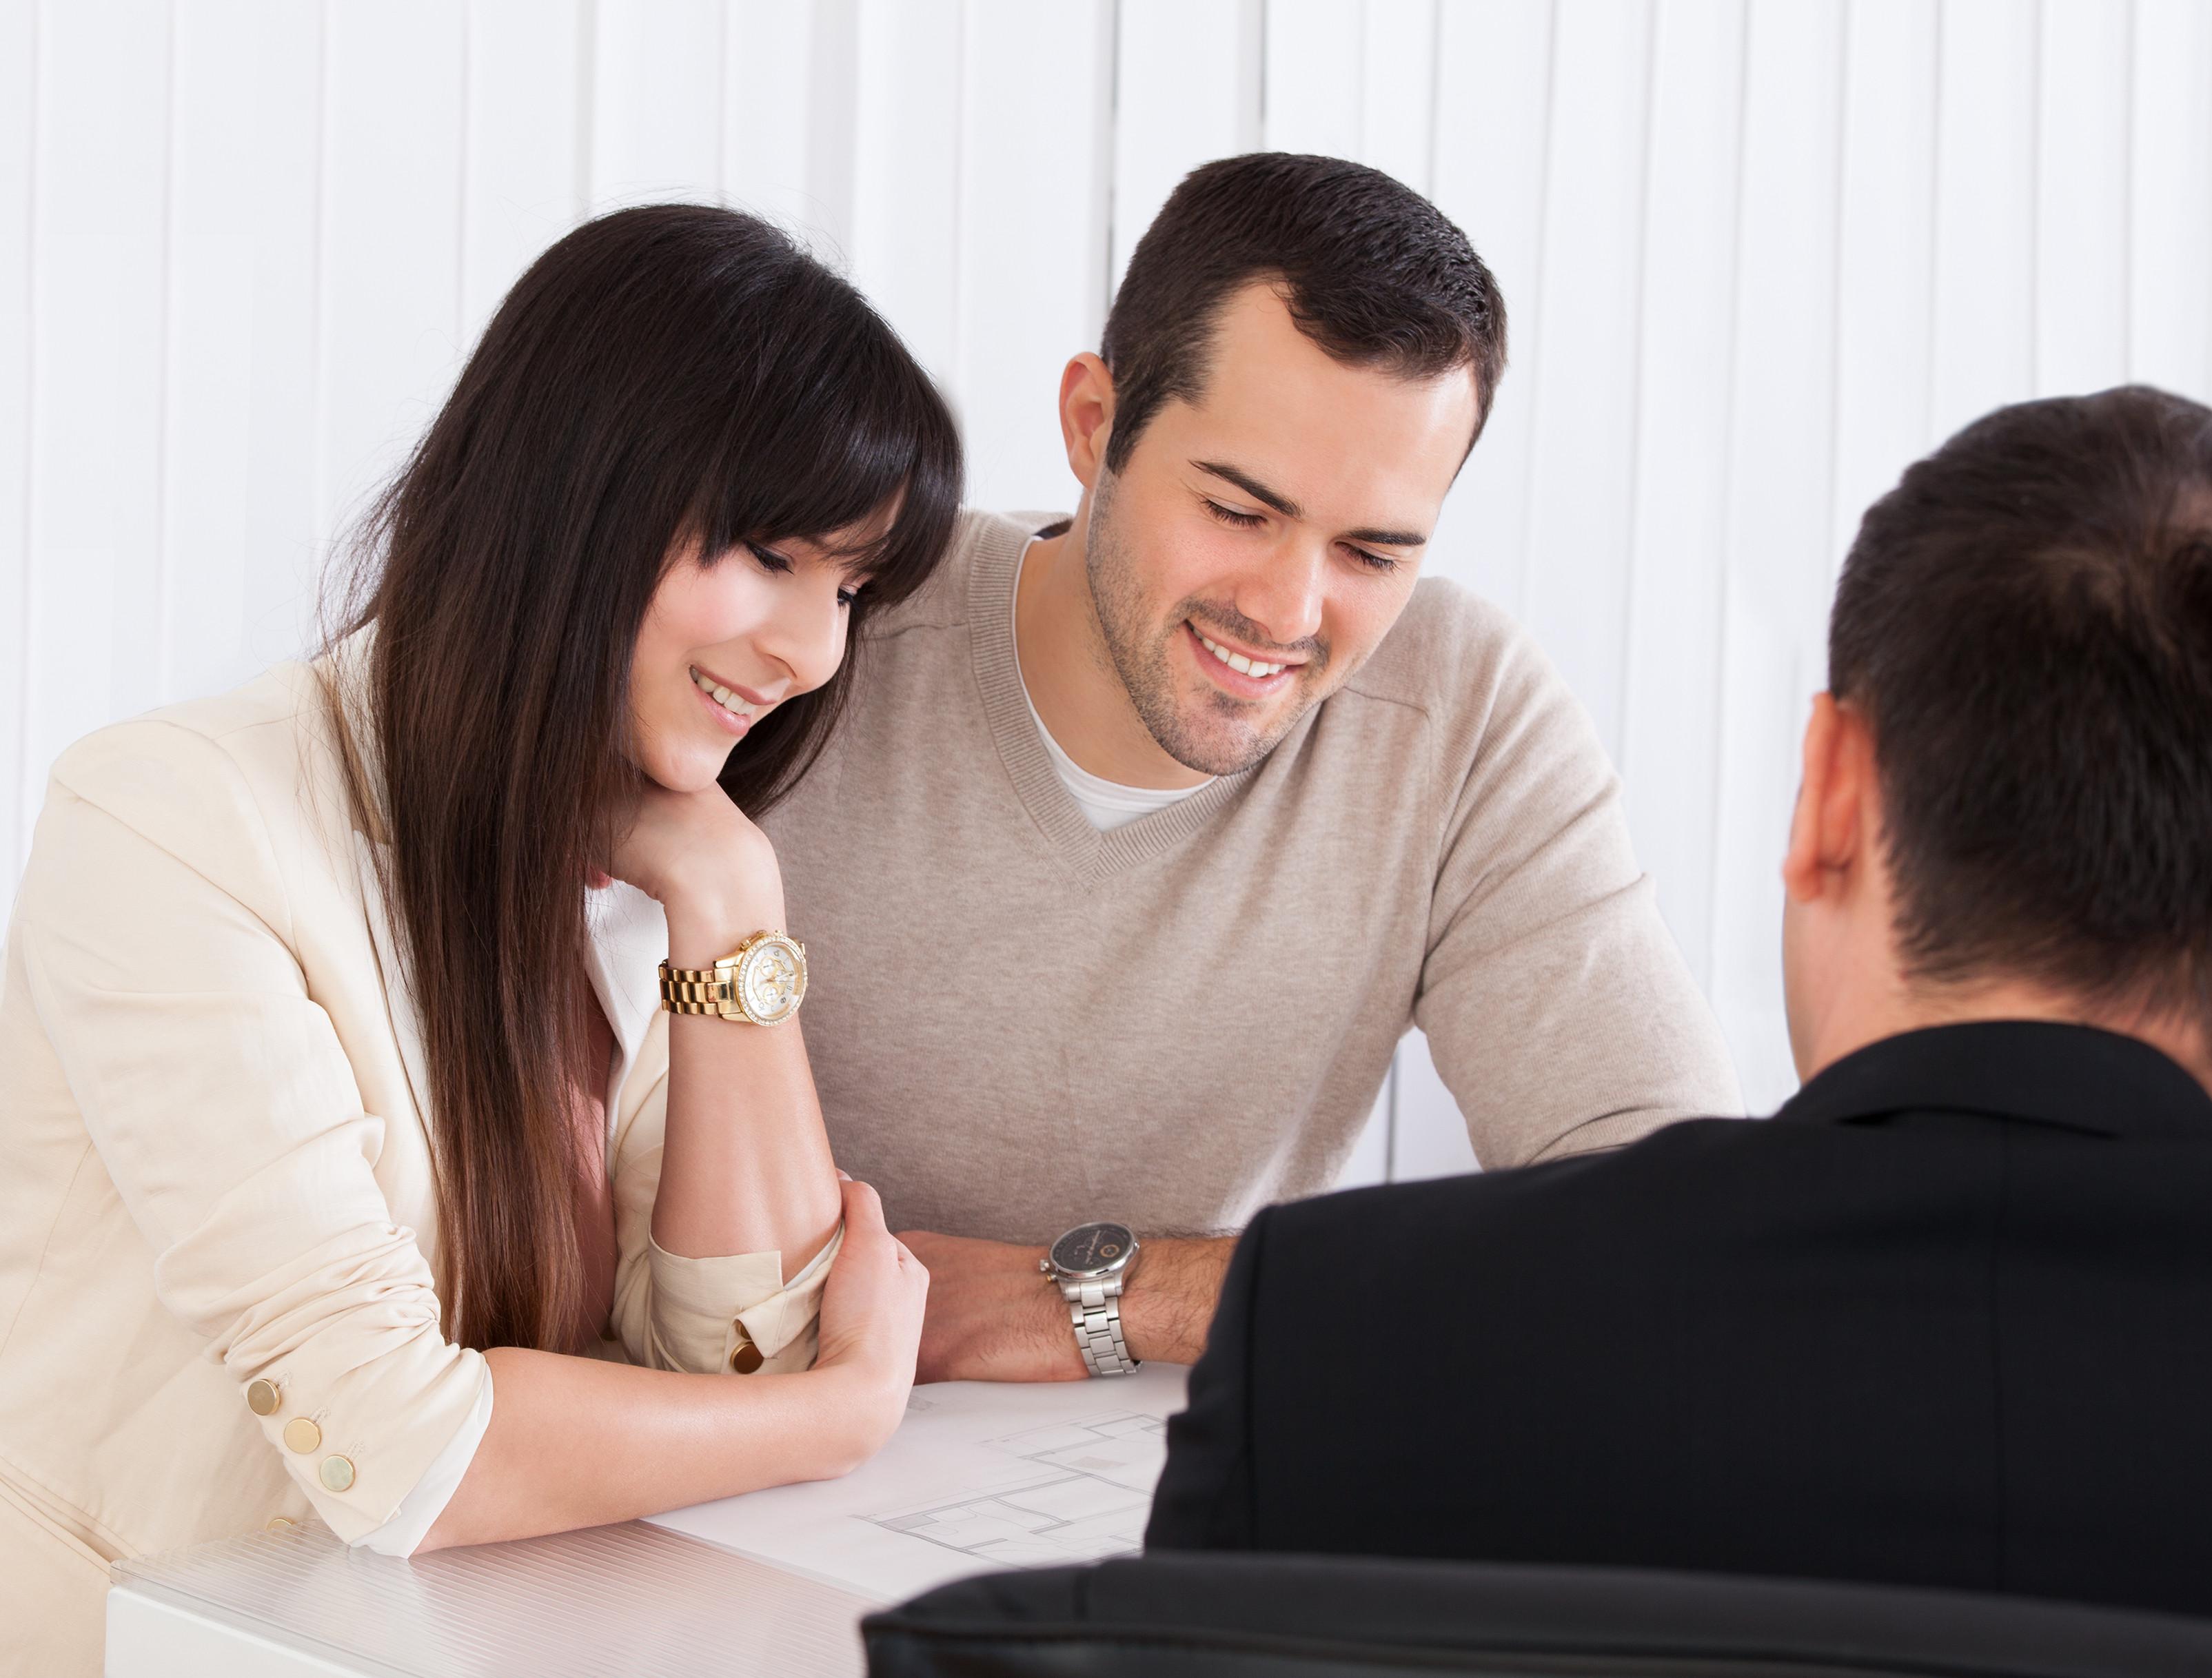 In-person Consultation Session